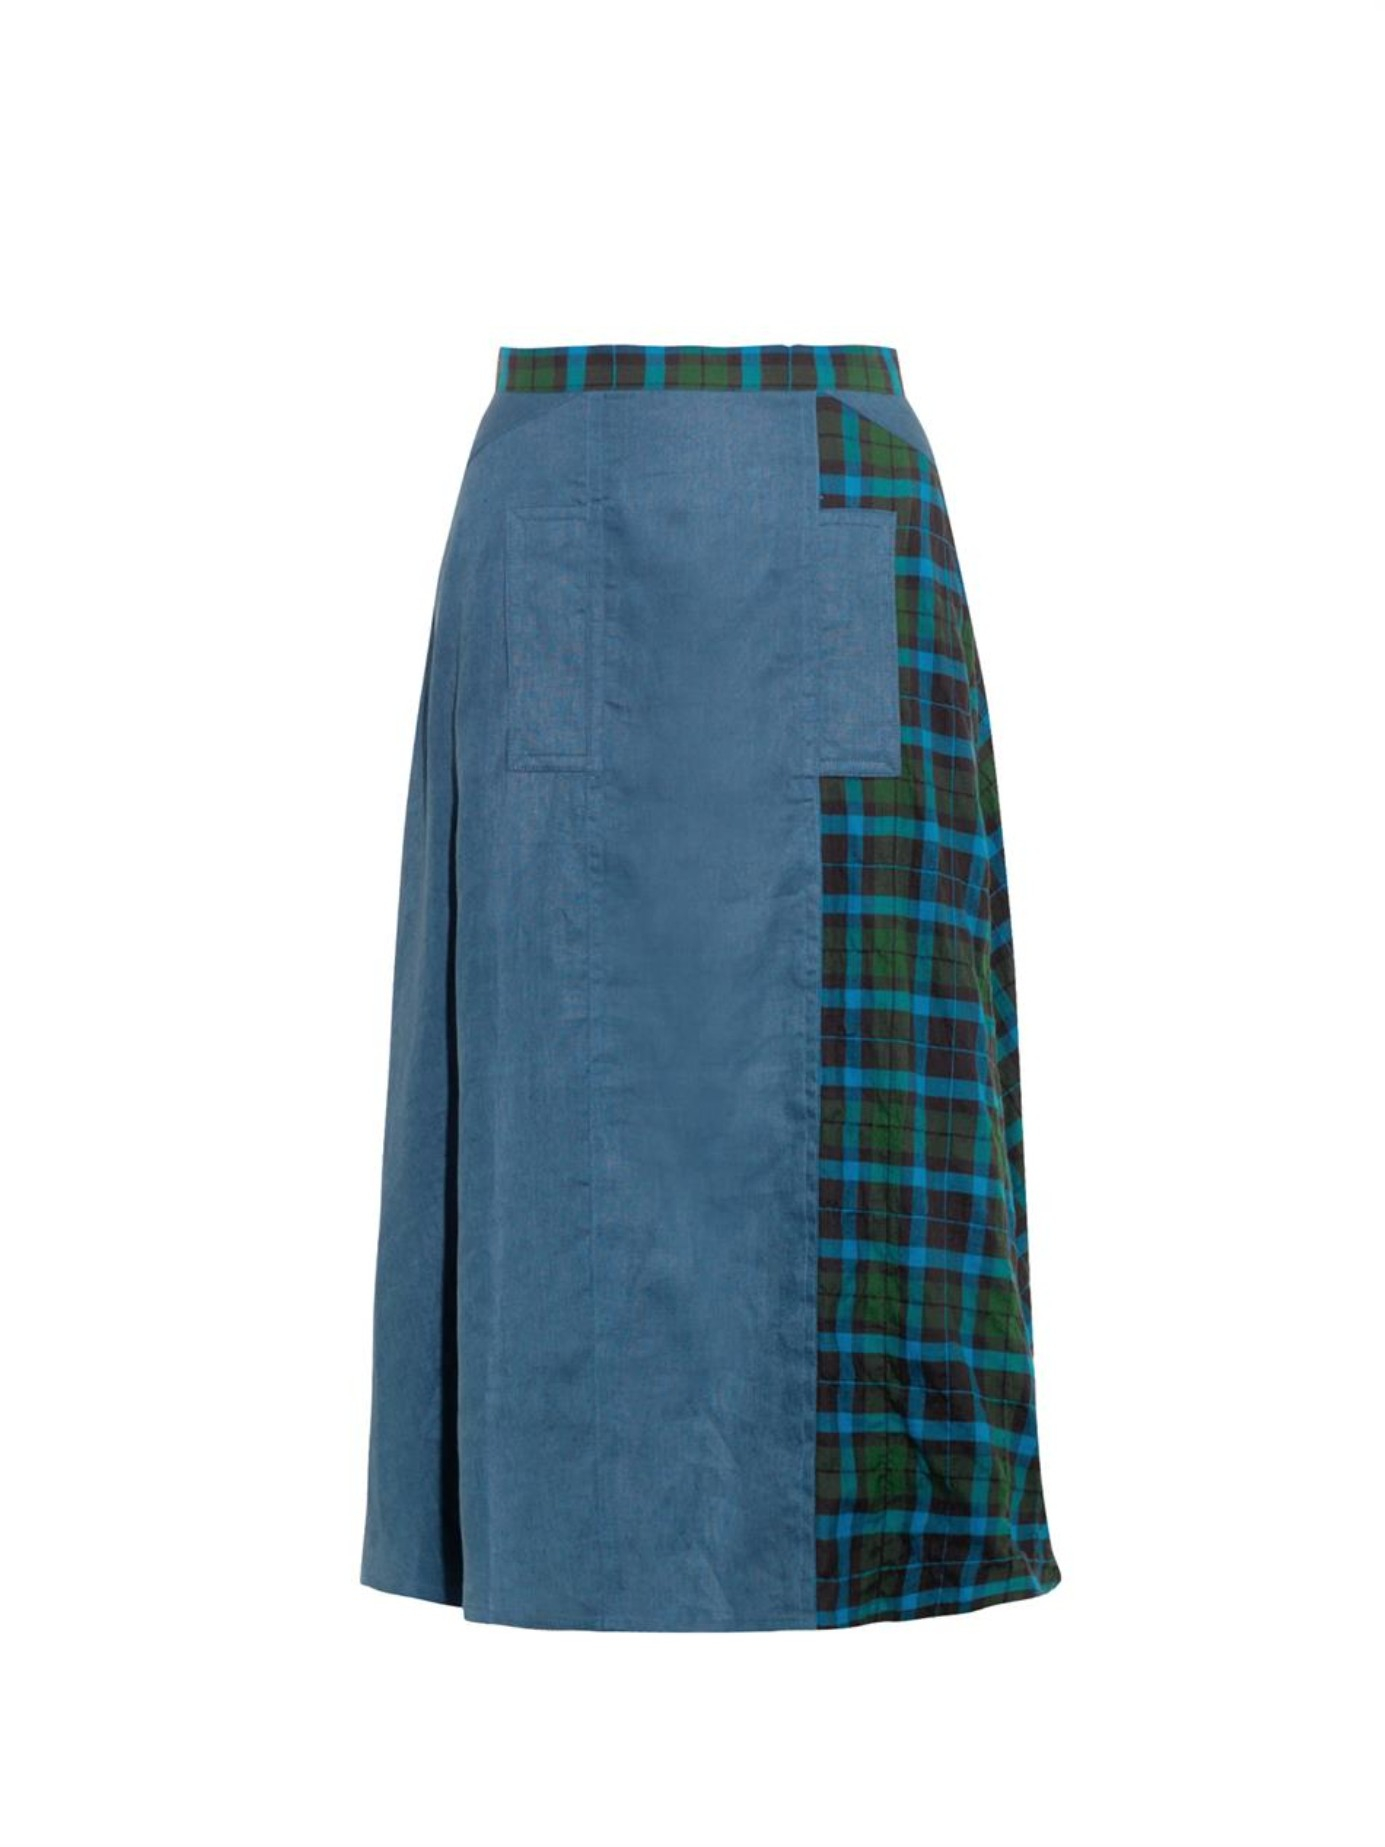 yohji yamamoto regulation tartan panel cotton skirt in